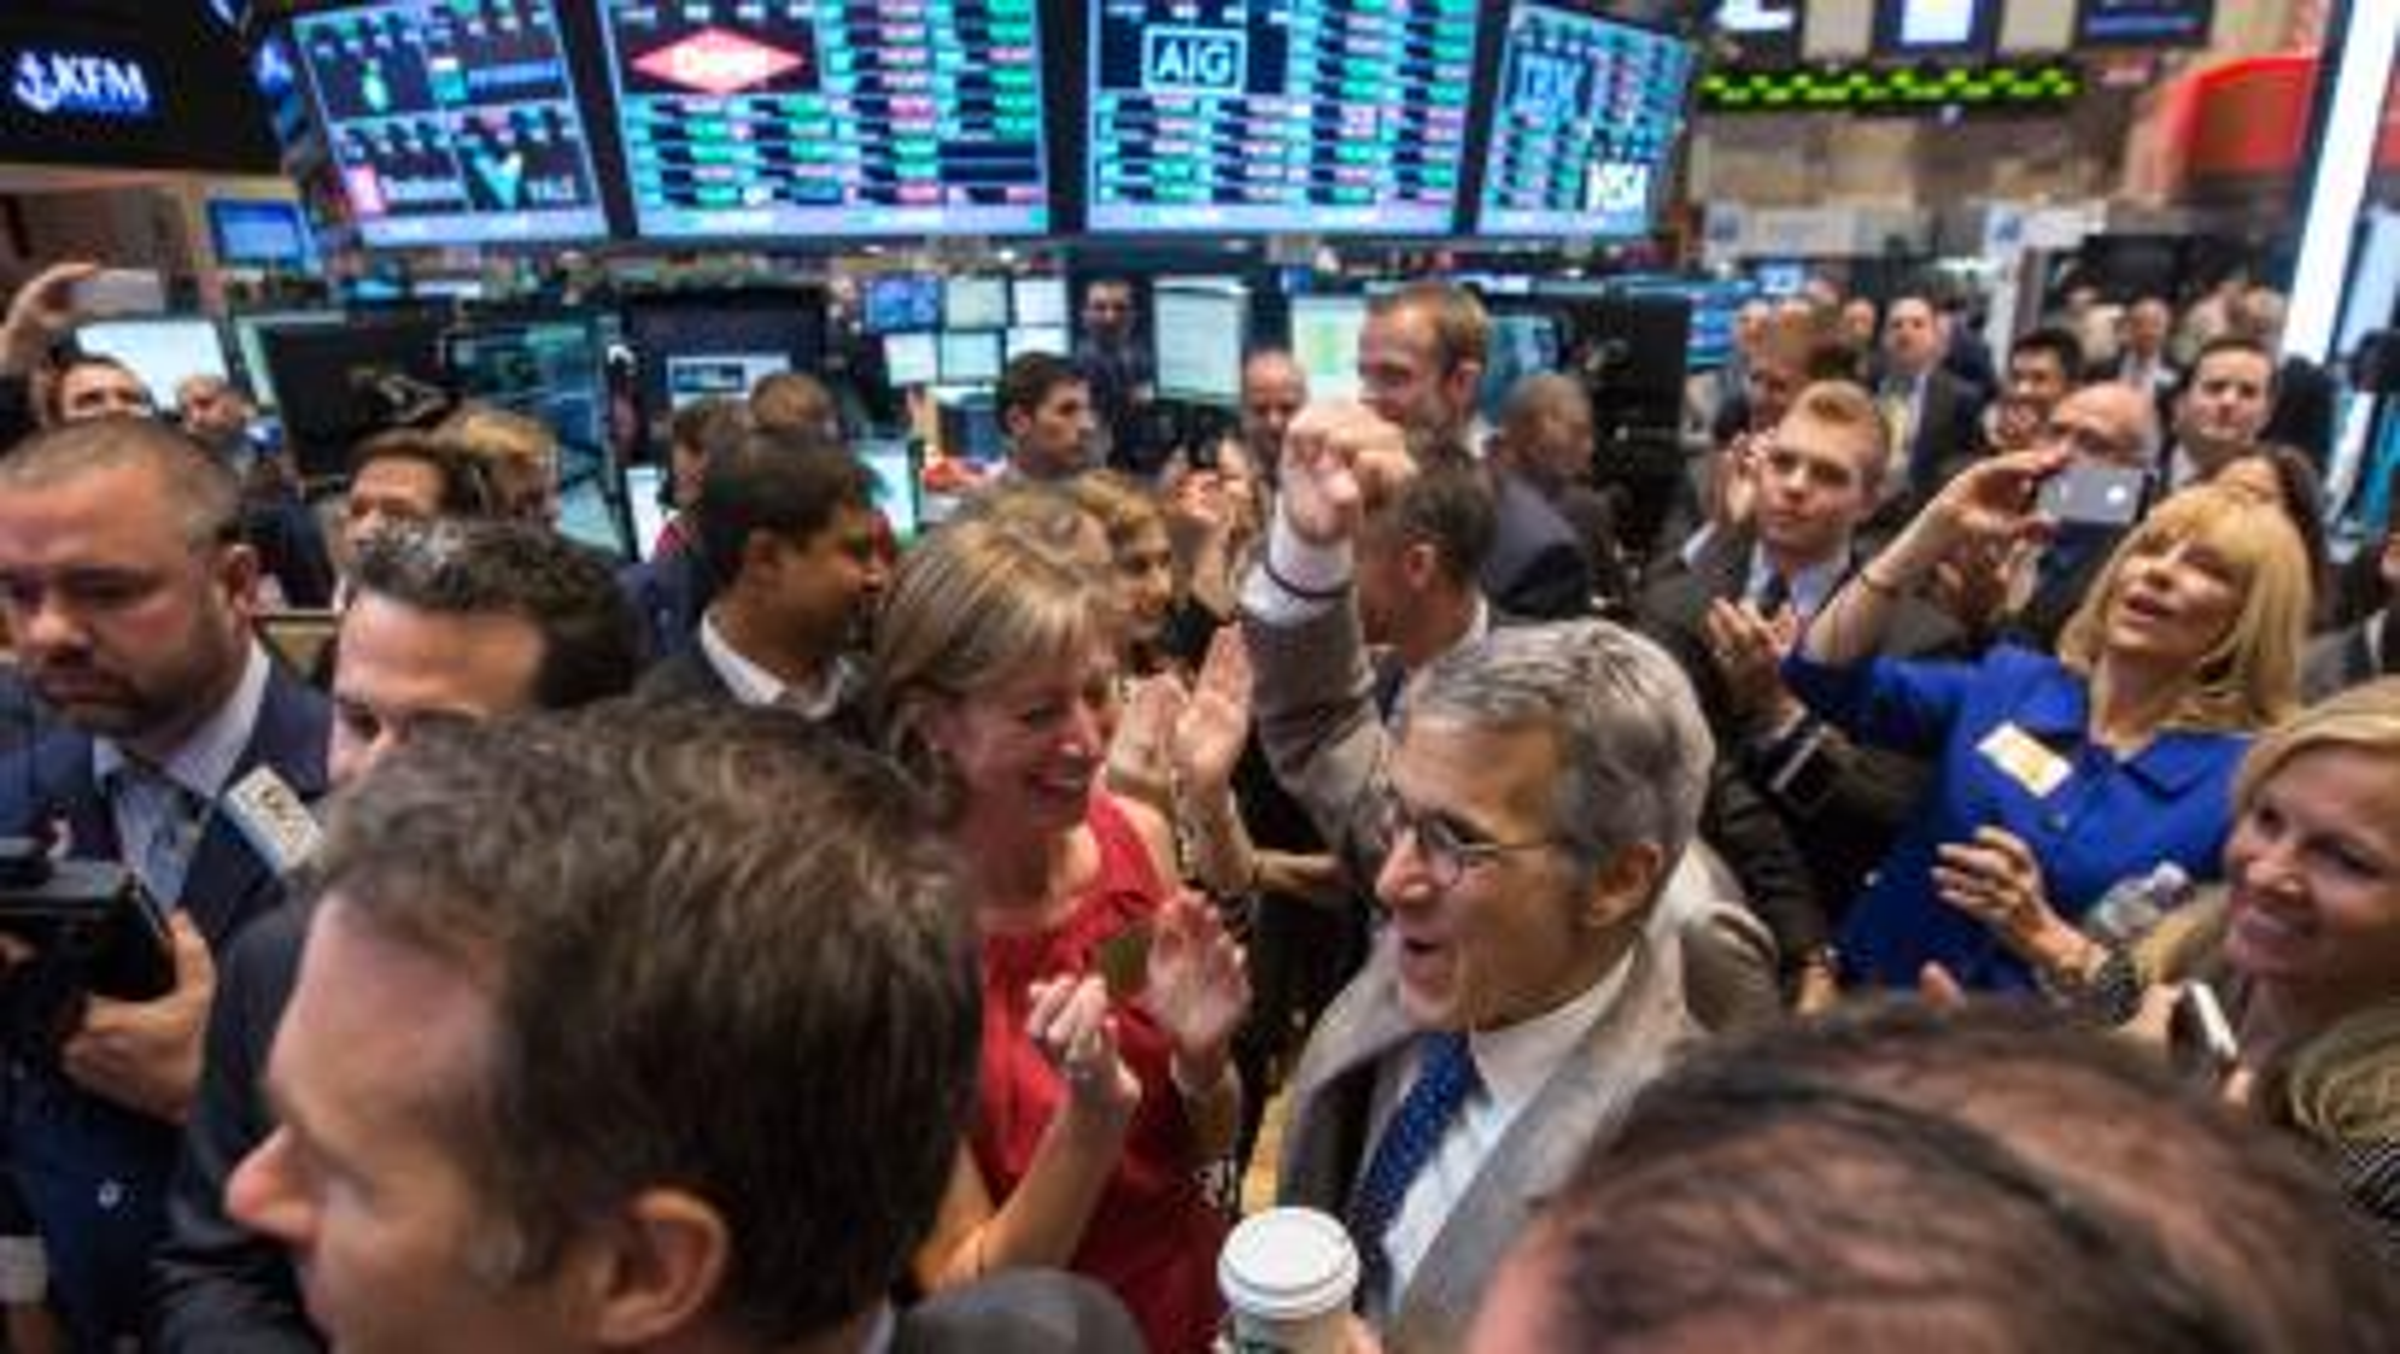 Castlight Health Inc. CEO Giovanni Colella celebrates his company's IPO on the floor of the New York Stock Exchange